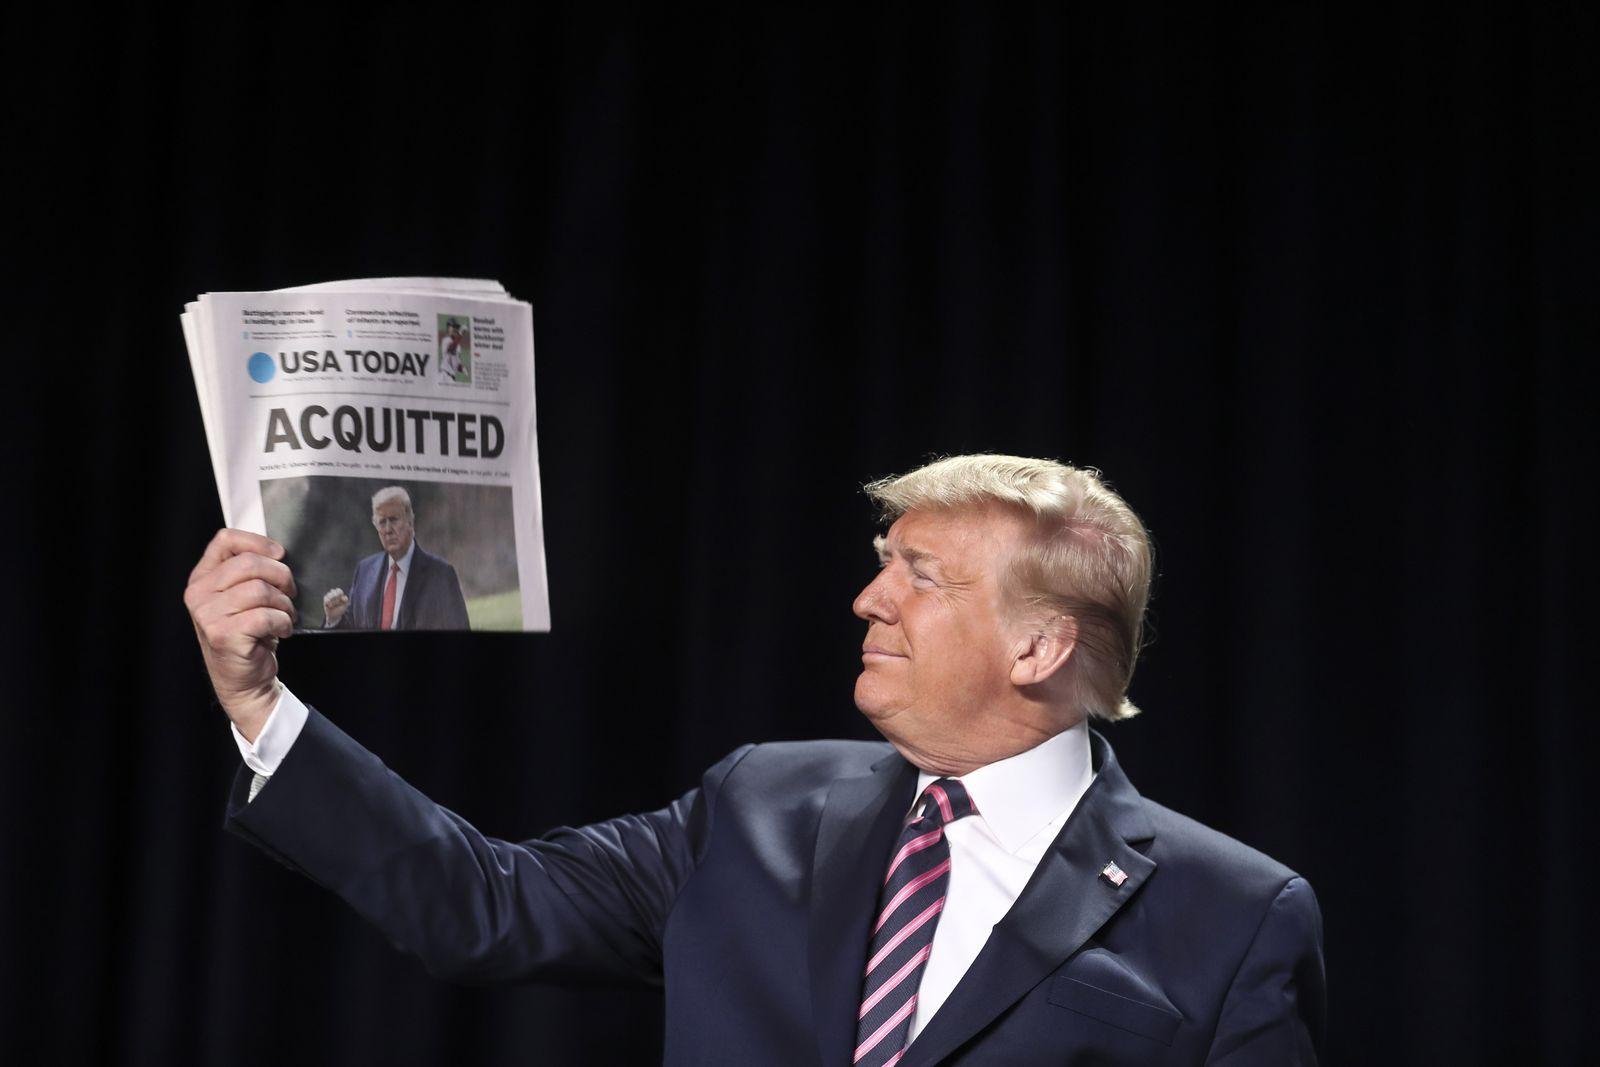 US President Trump attends 68th Annual National Prayer Breakfast, Washington, USA - 07 Feb 2020